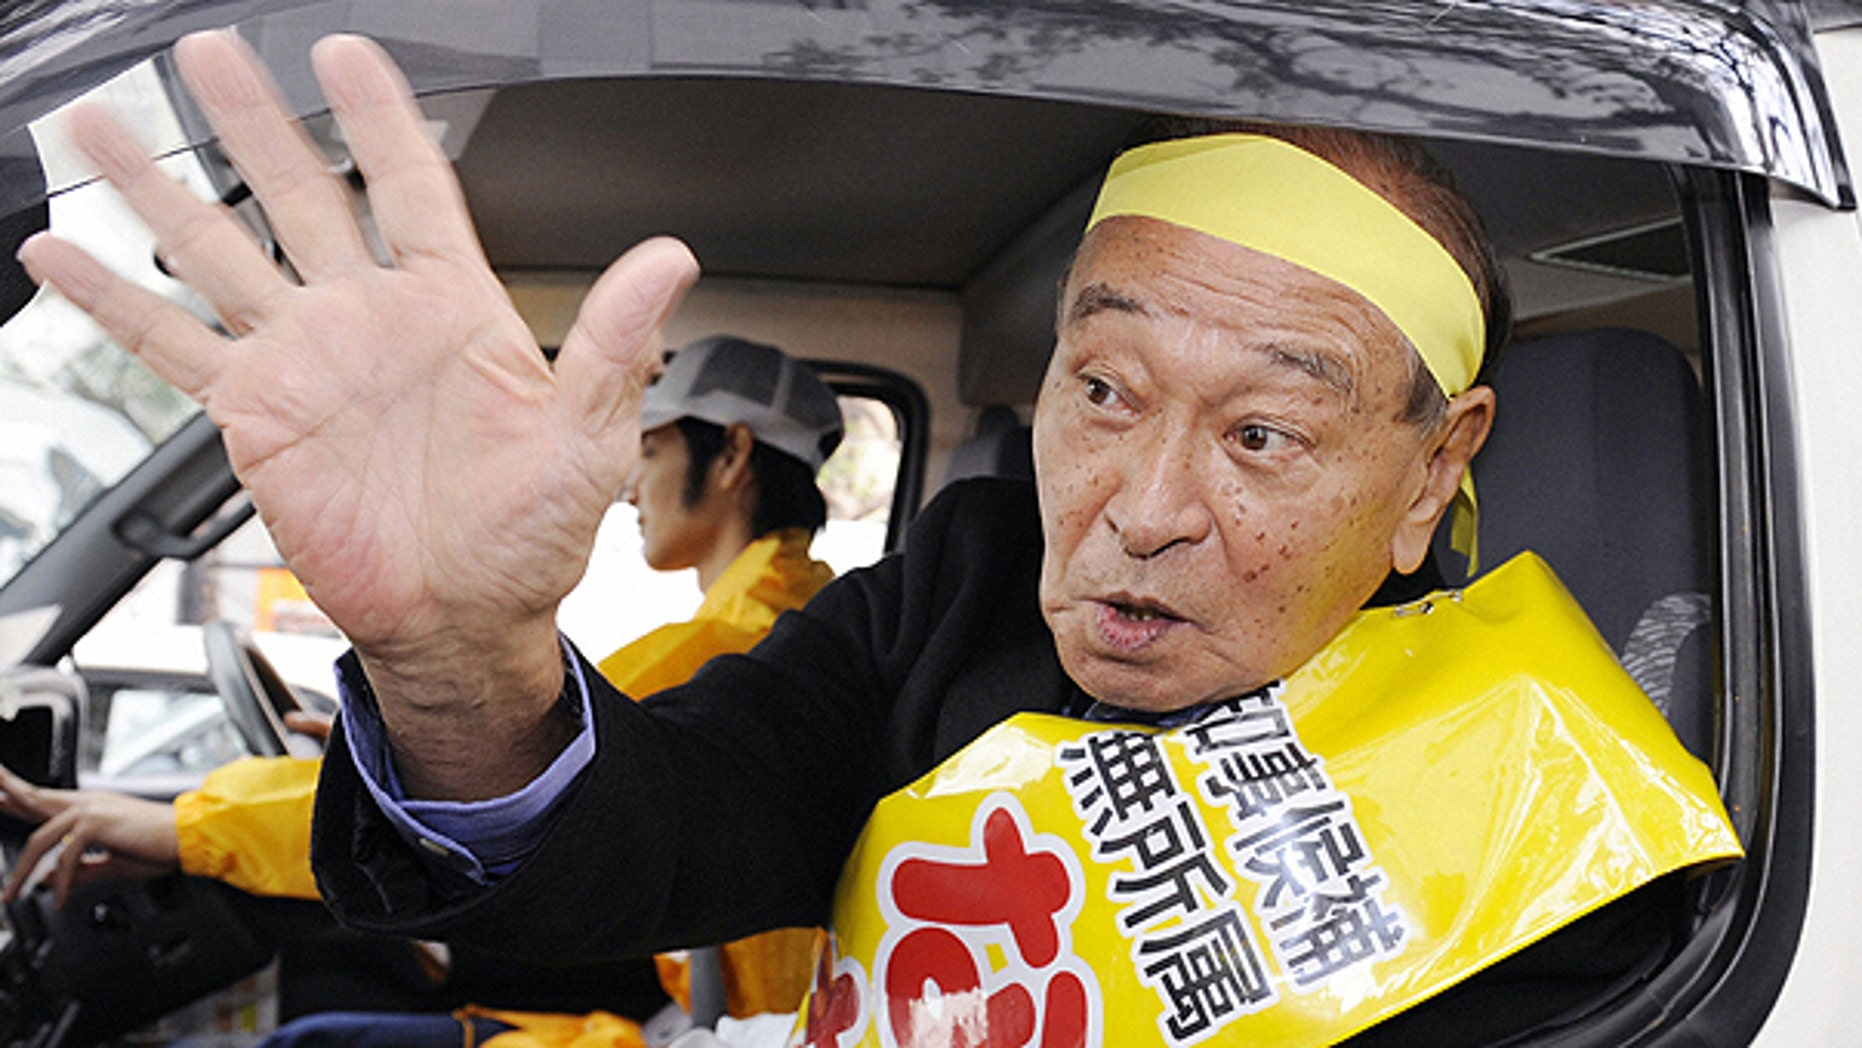 Nov. 11: Incumbent Okinawa Gov. Hirokazu Nakaima waves from a vehicle during his campaign for the Nov. 28 Okinawa gubernatorial election in Naha, Okinawa Prefecture, southern Japan.